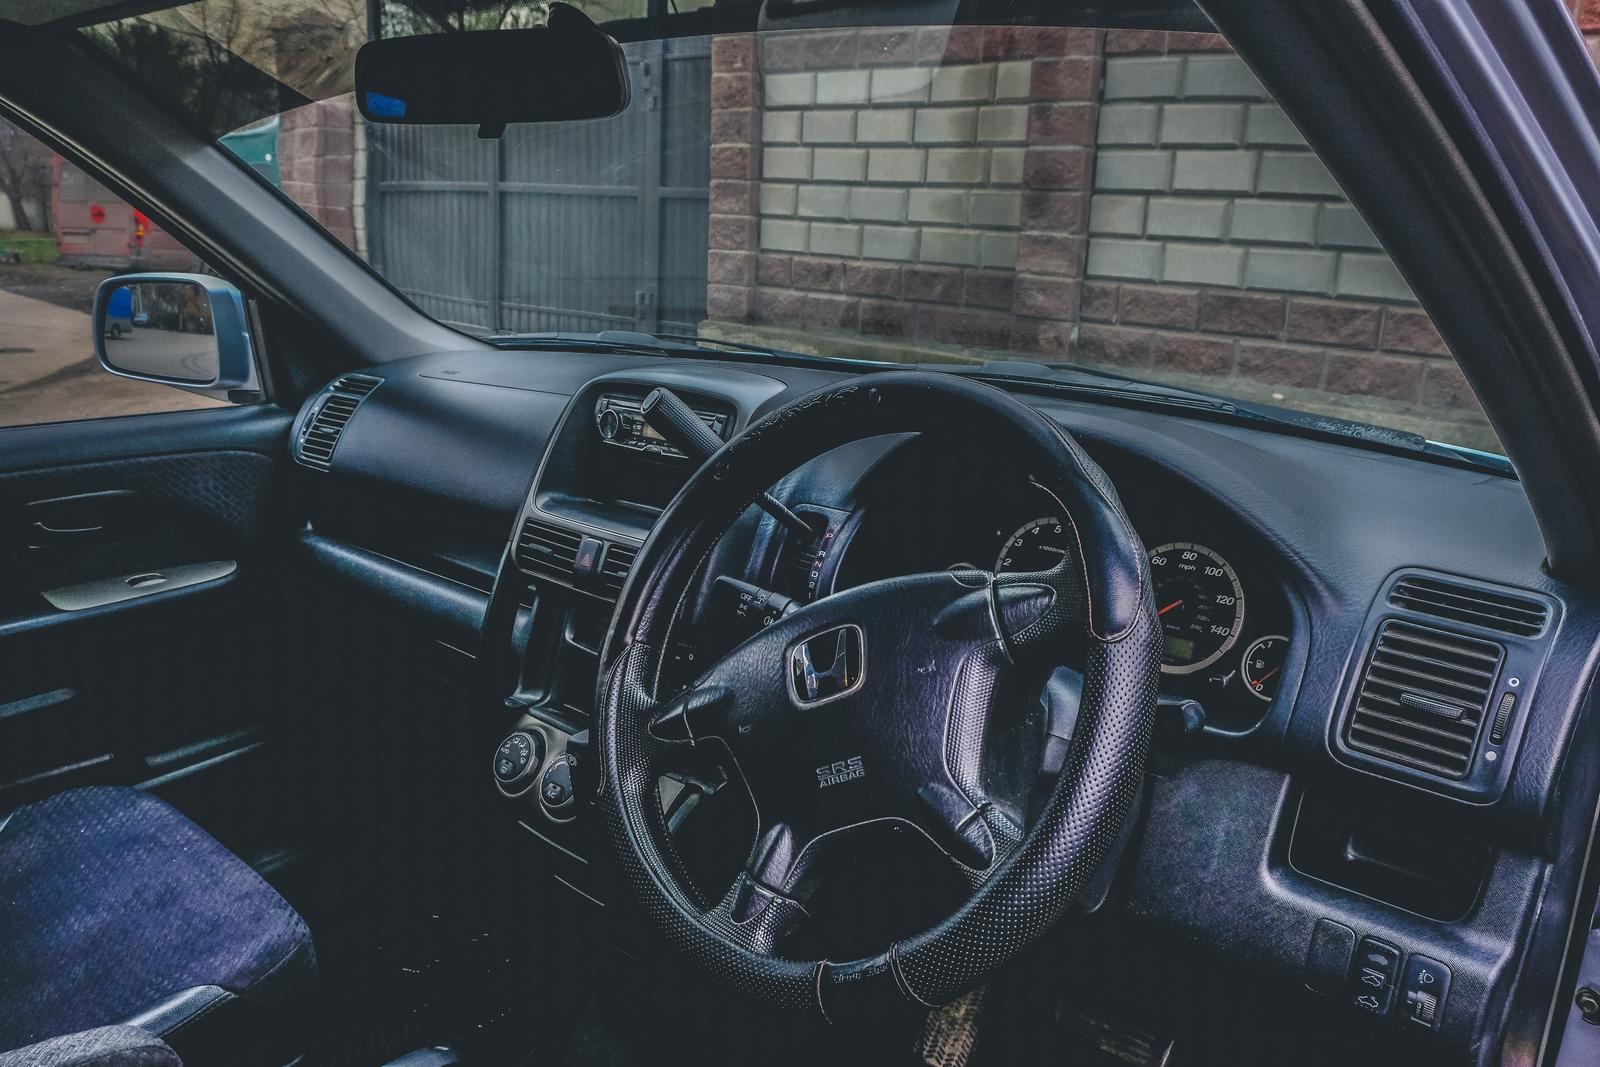 Honda CRV Driver side